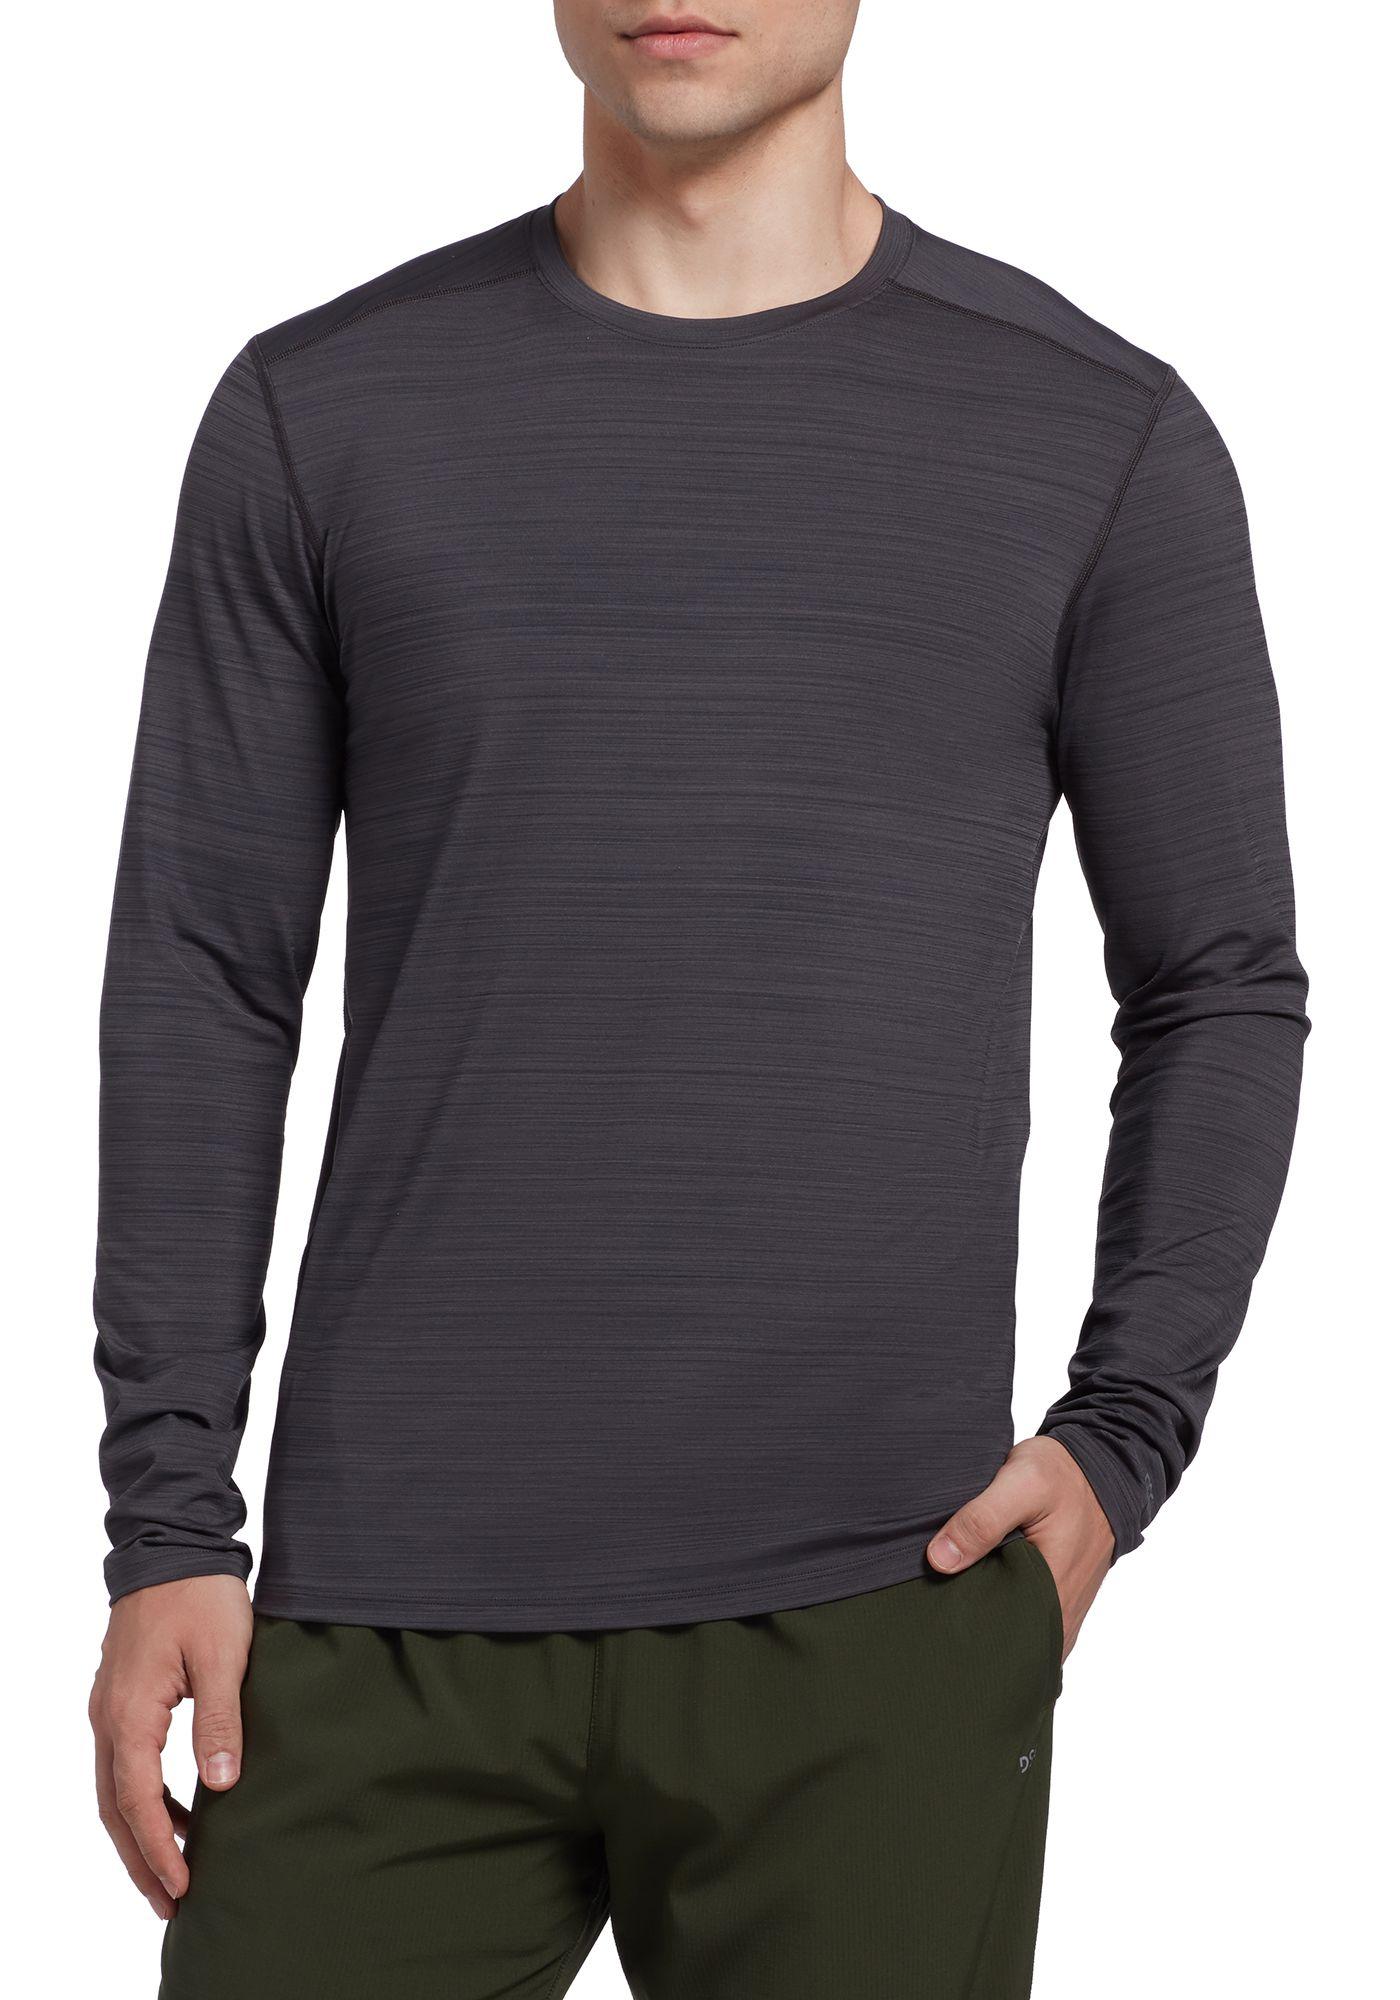 DSG Men's Barcode Training Long Sleeve Shirt